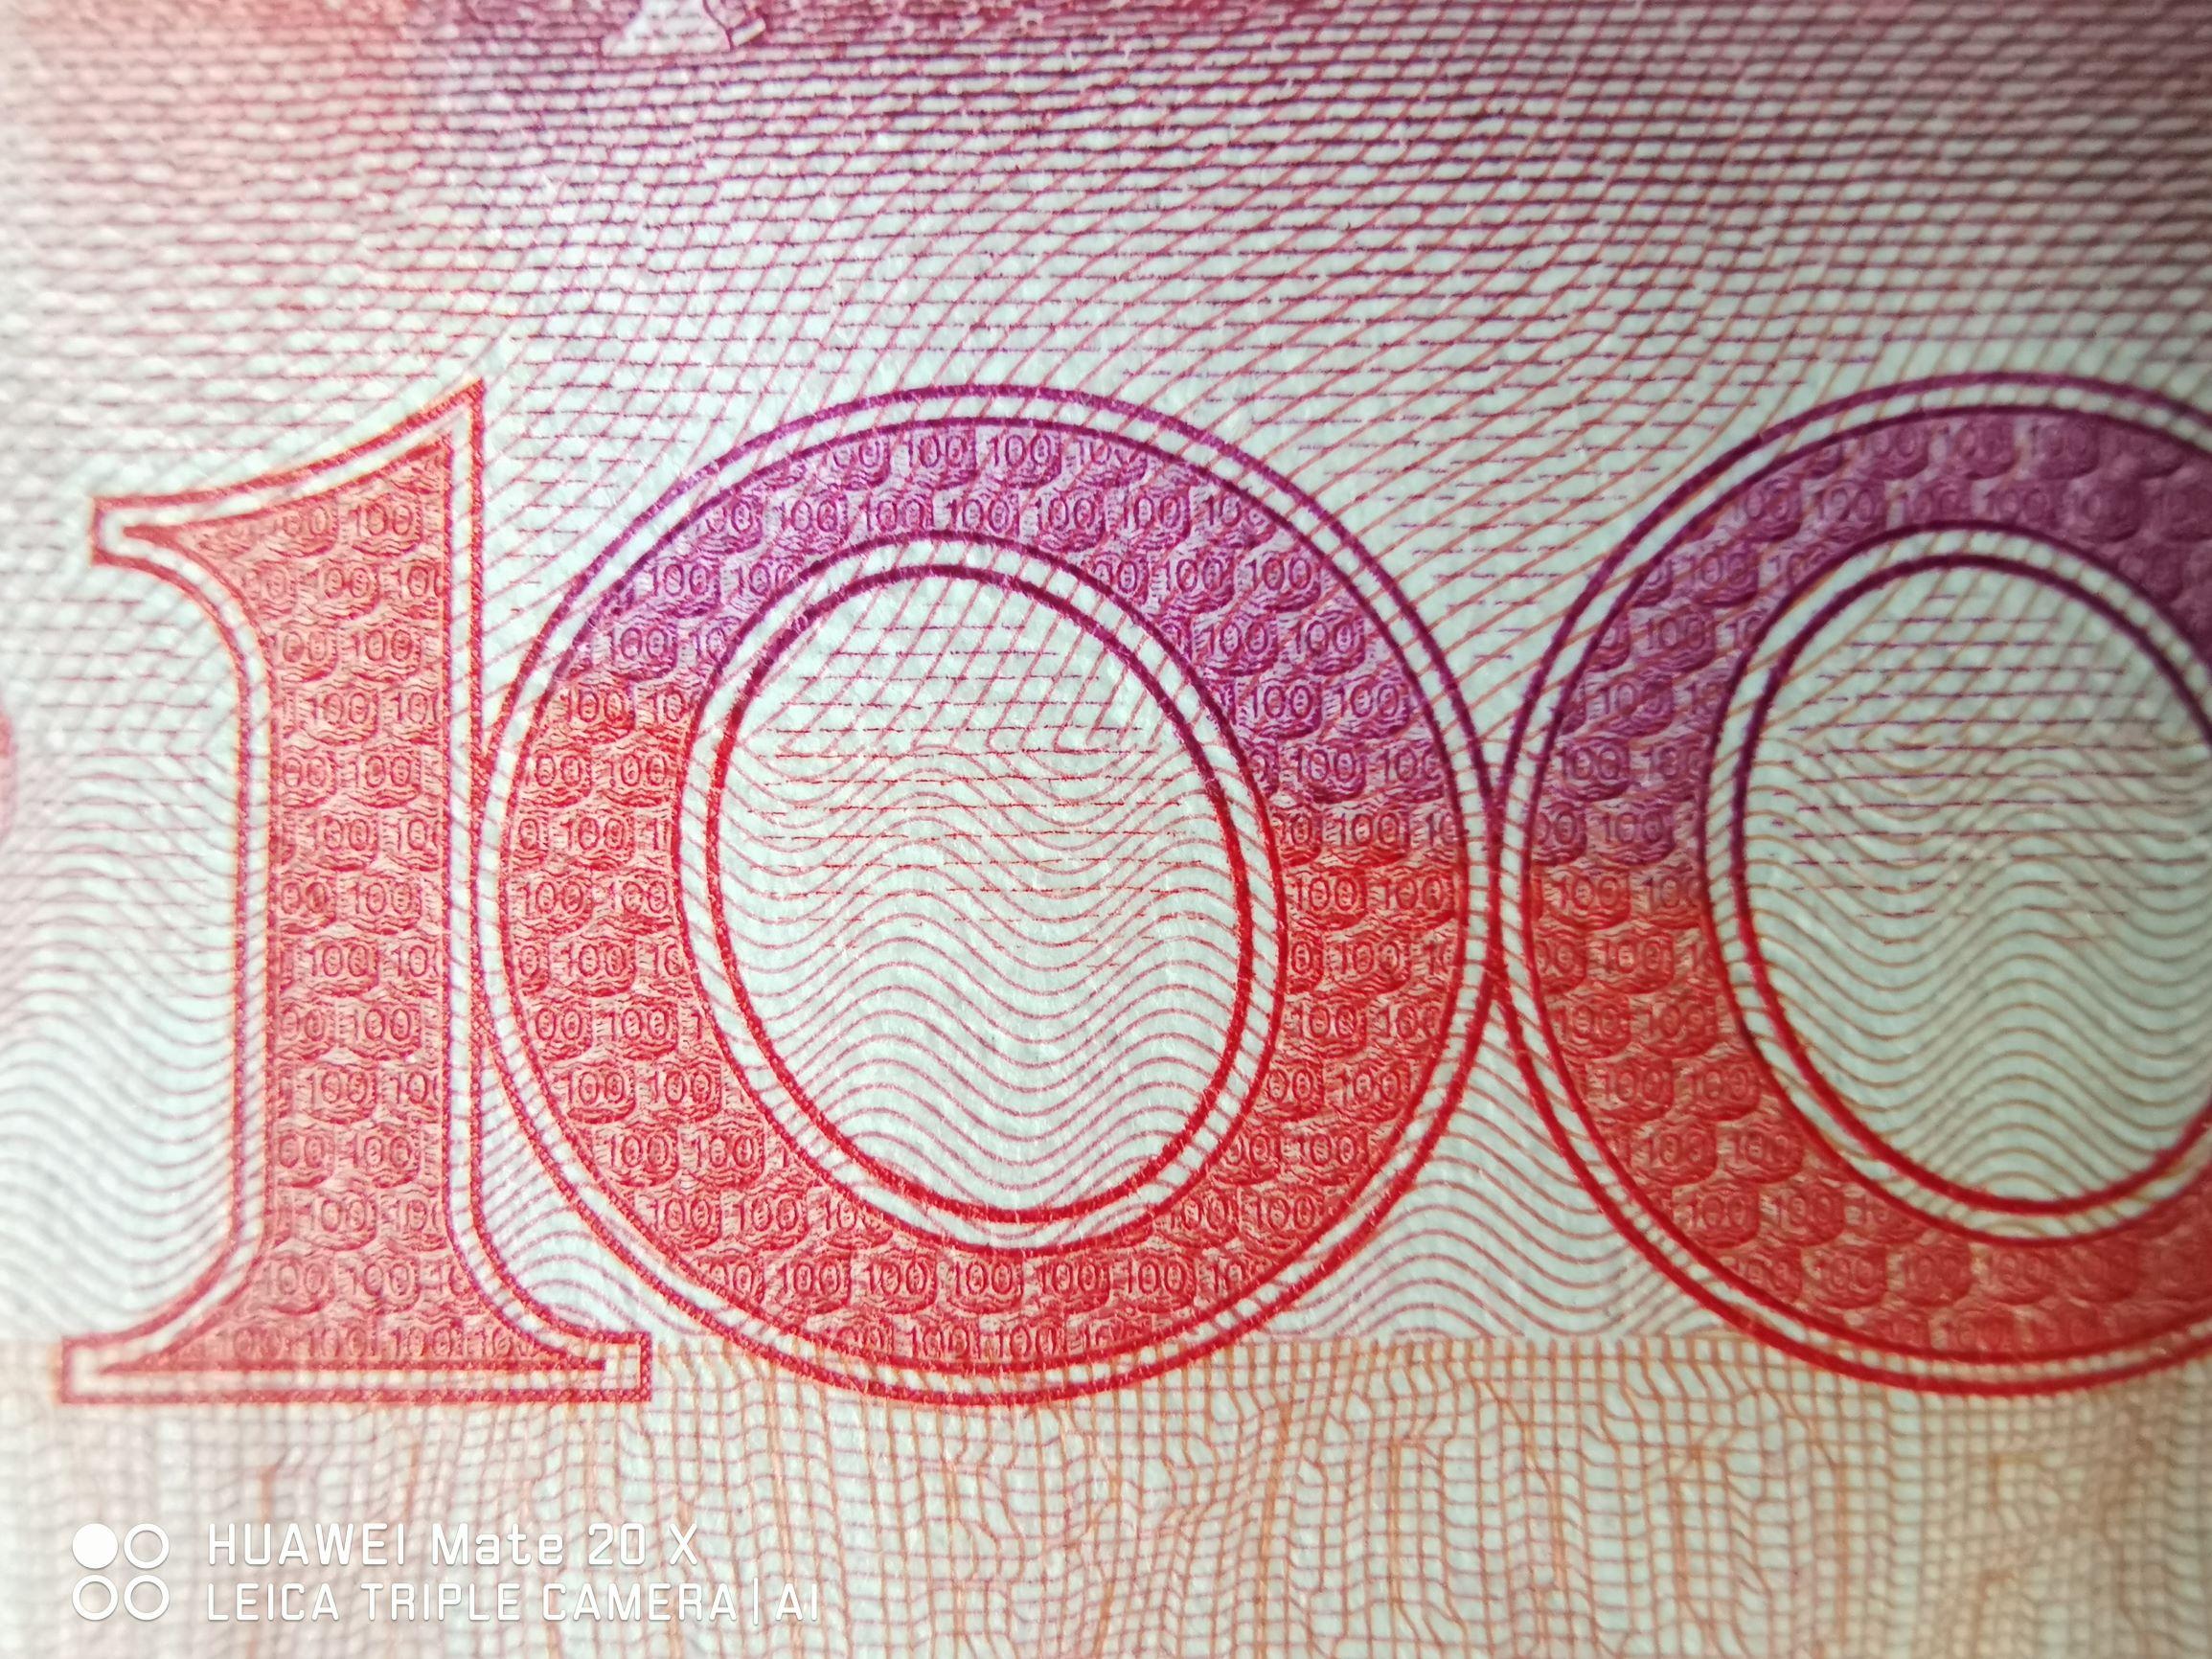 m20x-纸币.jpg